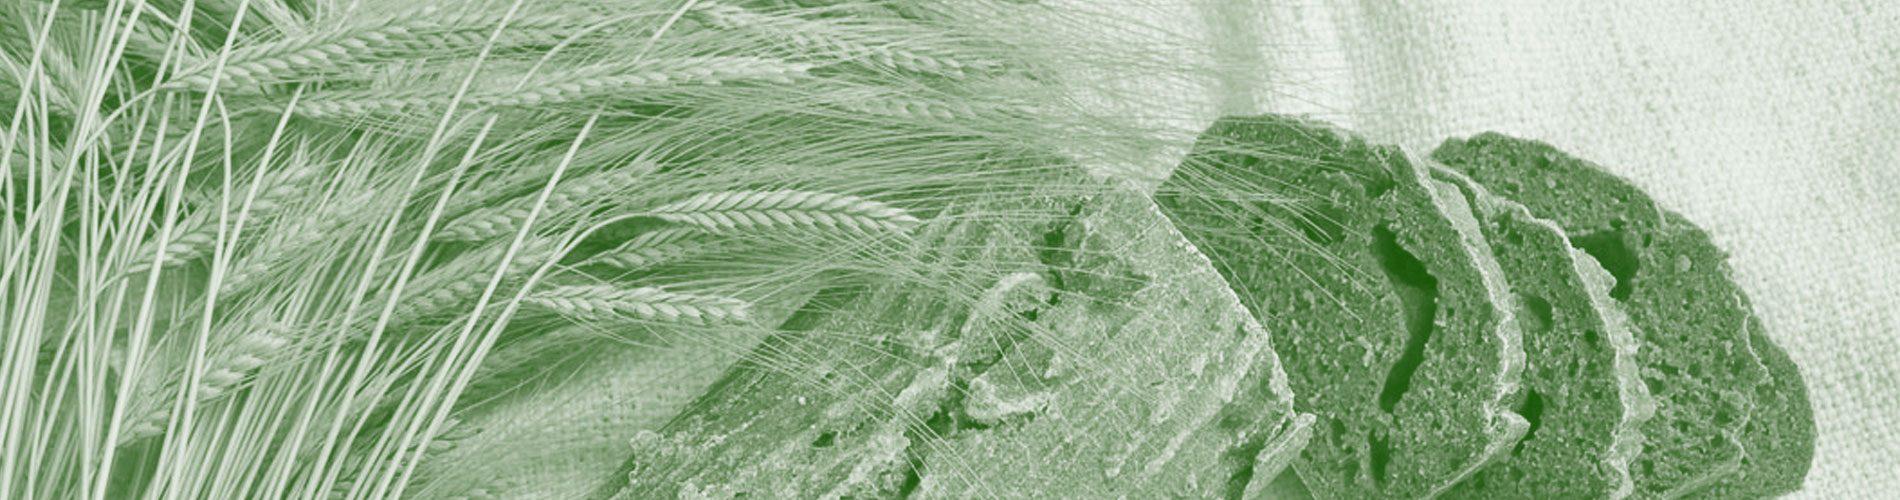 Cabecera Web